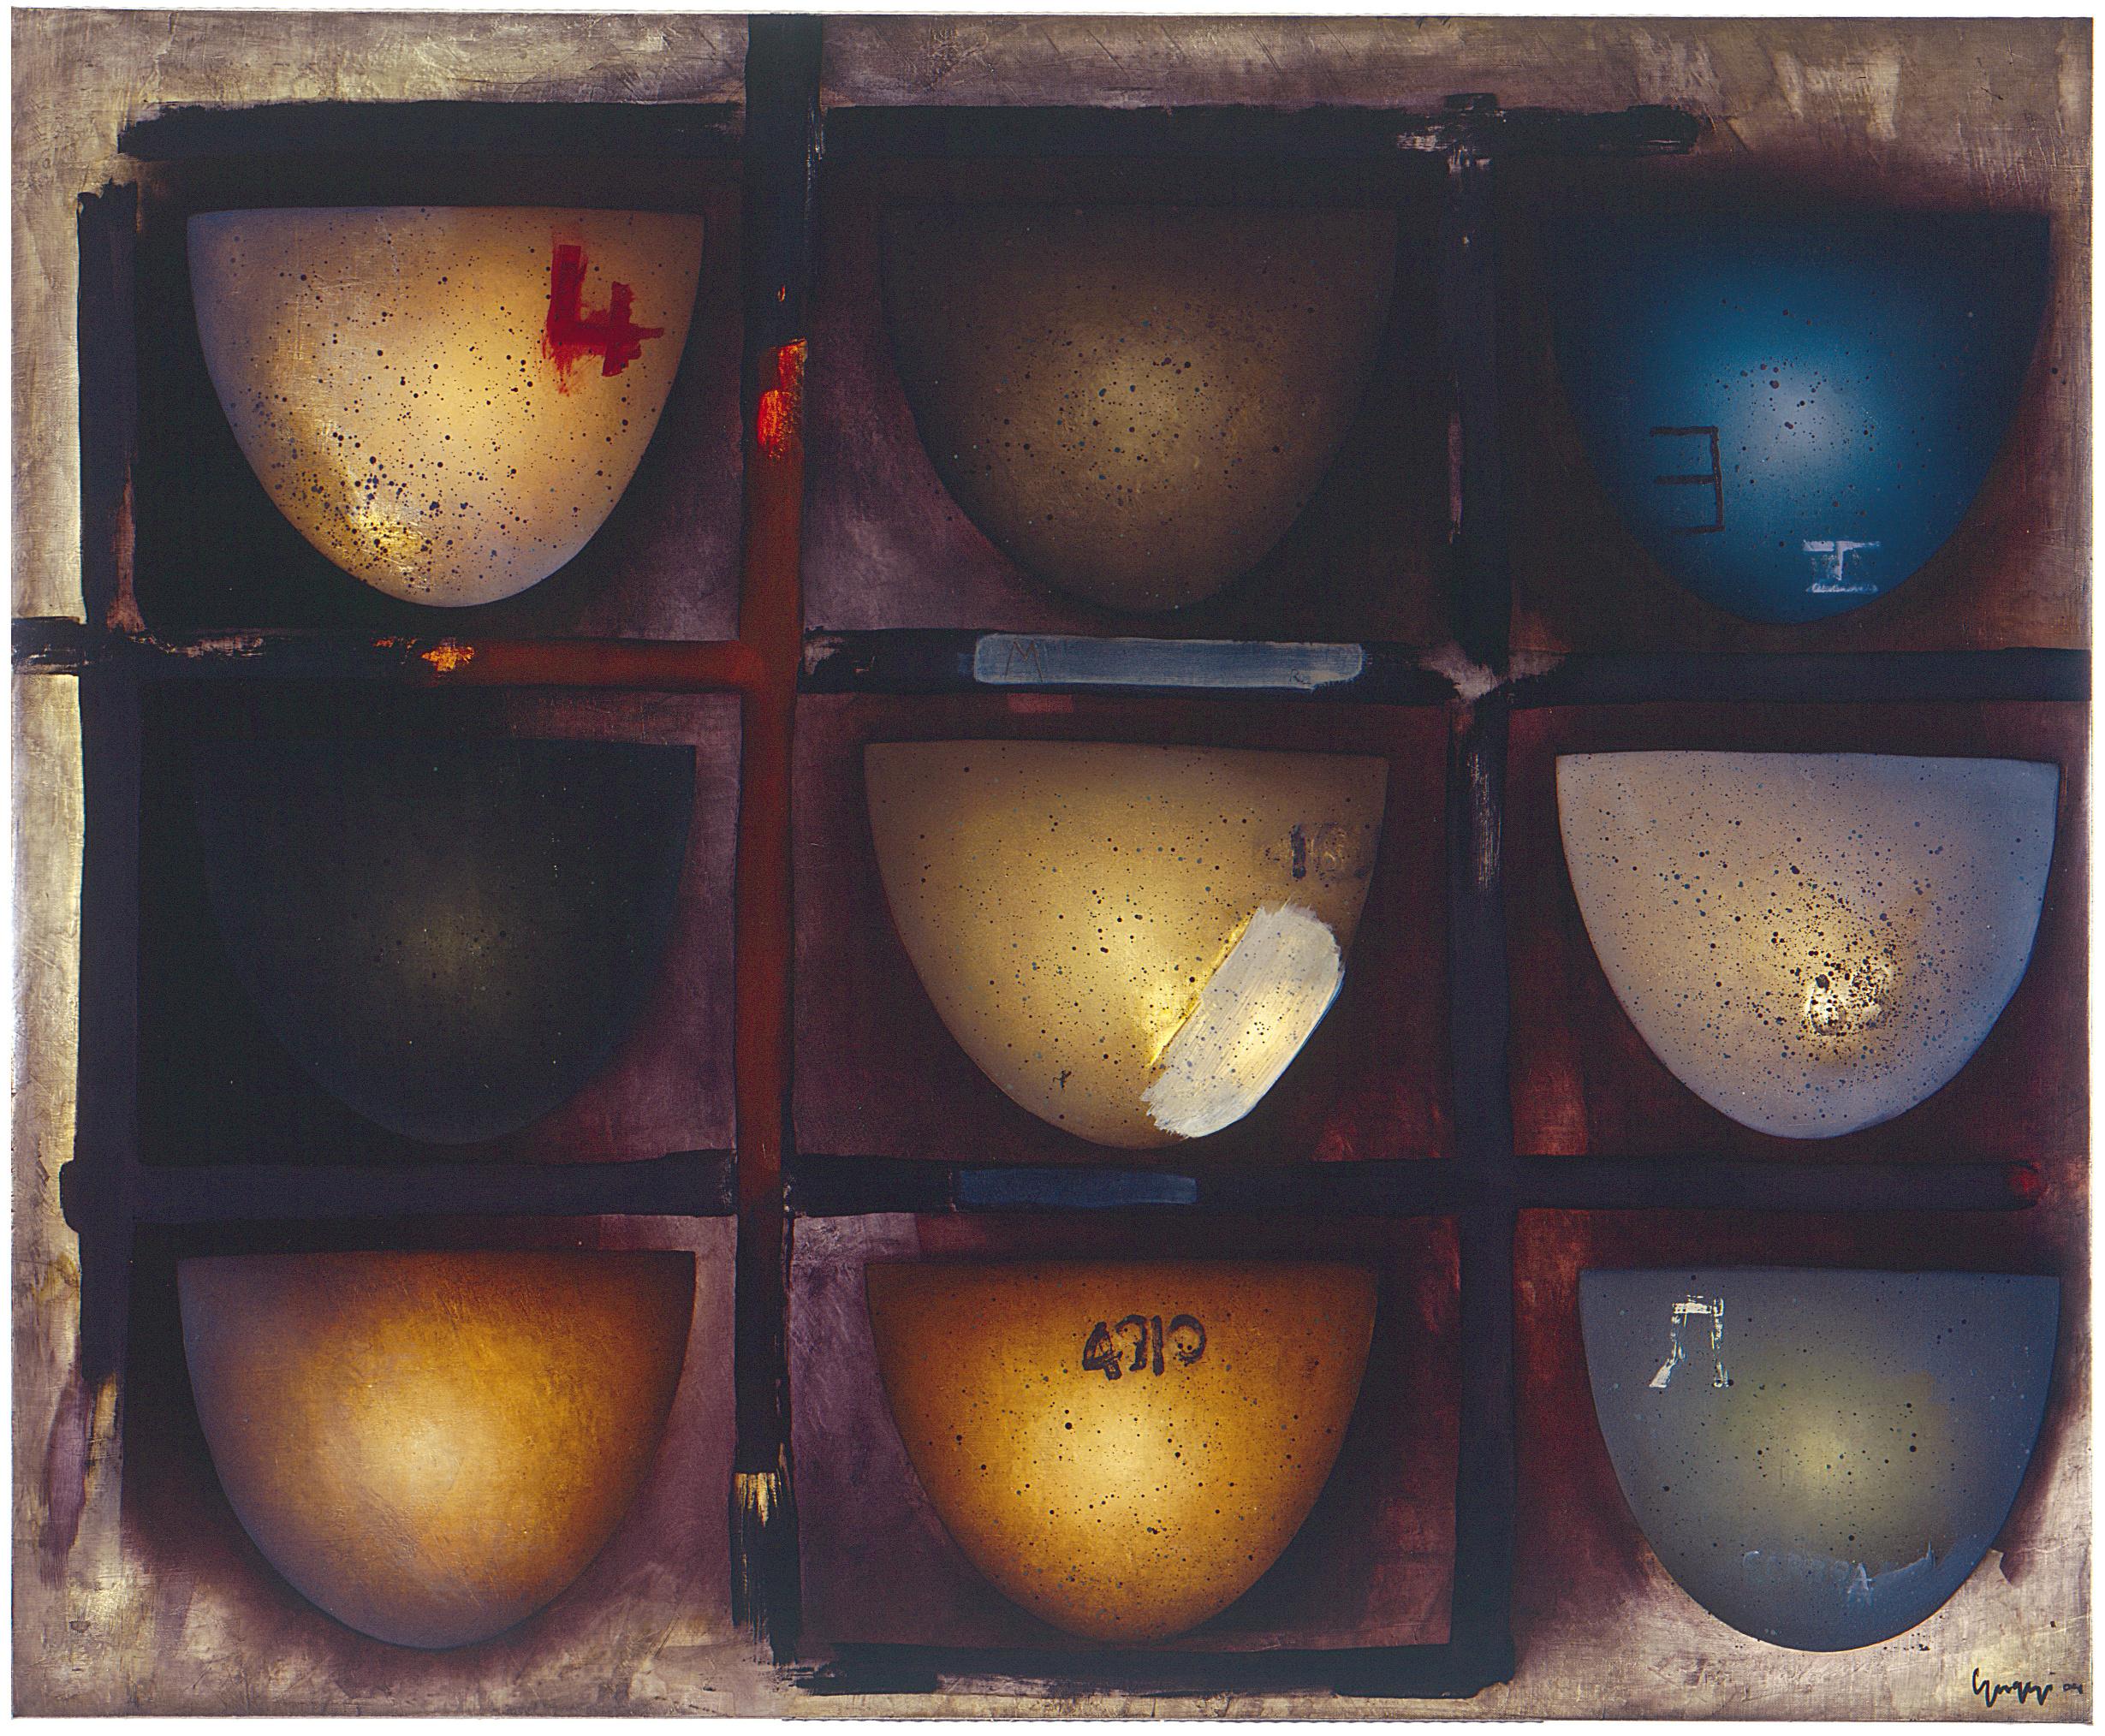 Speckled Bowls 1/04 (2004)